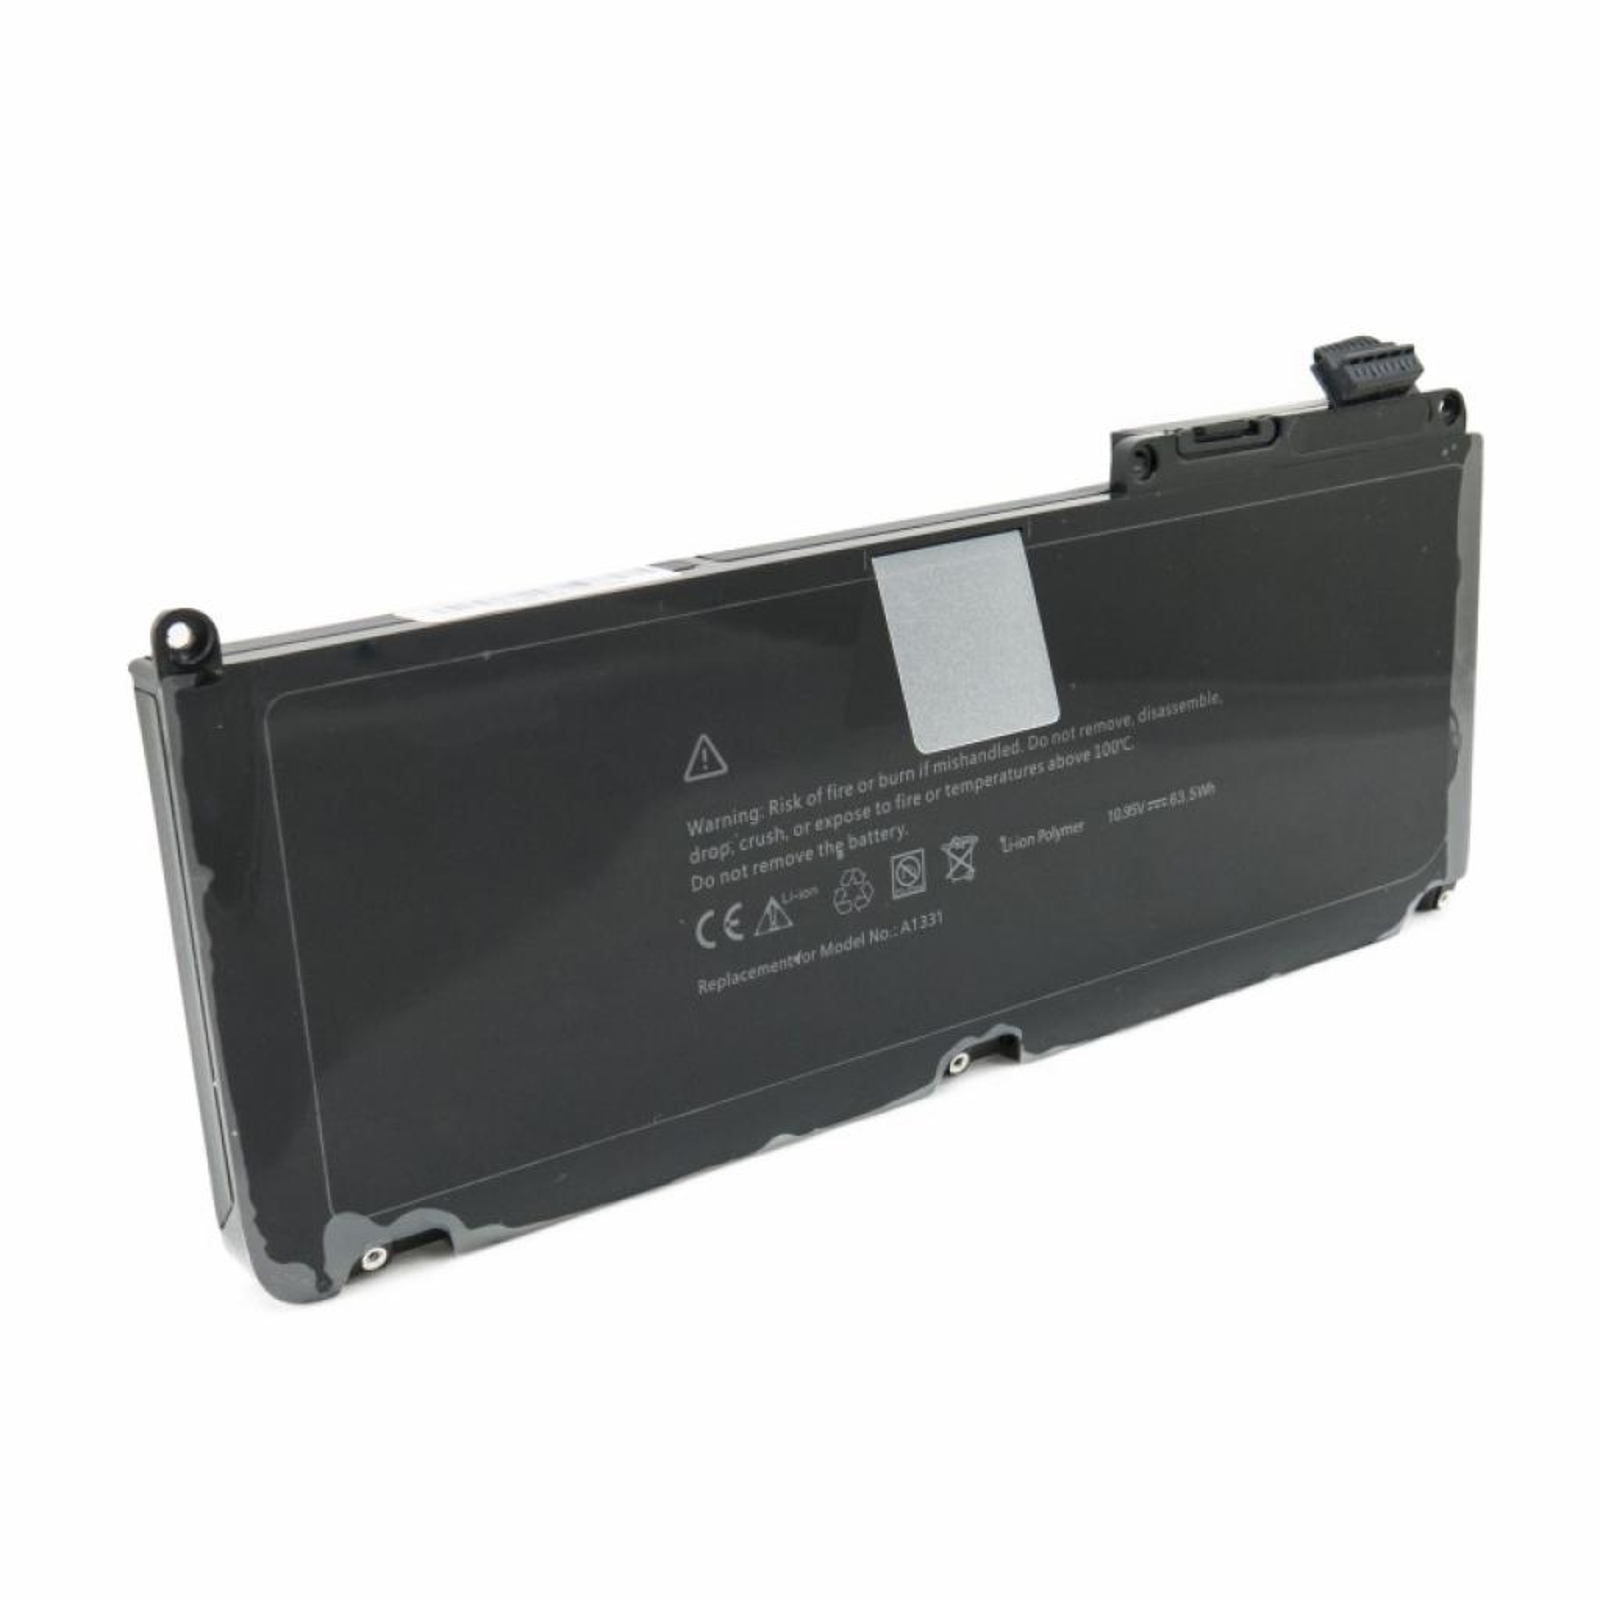 Аккумулятор для ноутбука Apple MacBook Pro (A1331) 63.5 Wh EXTRADIGITAL (BNA3918)